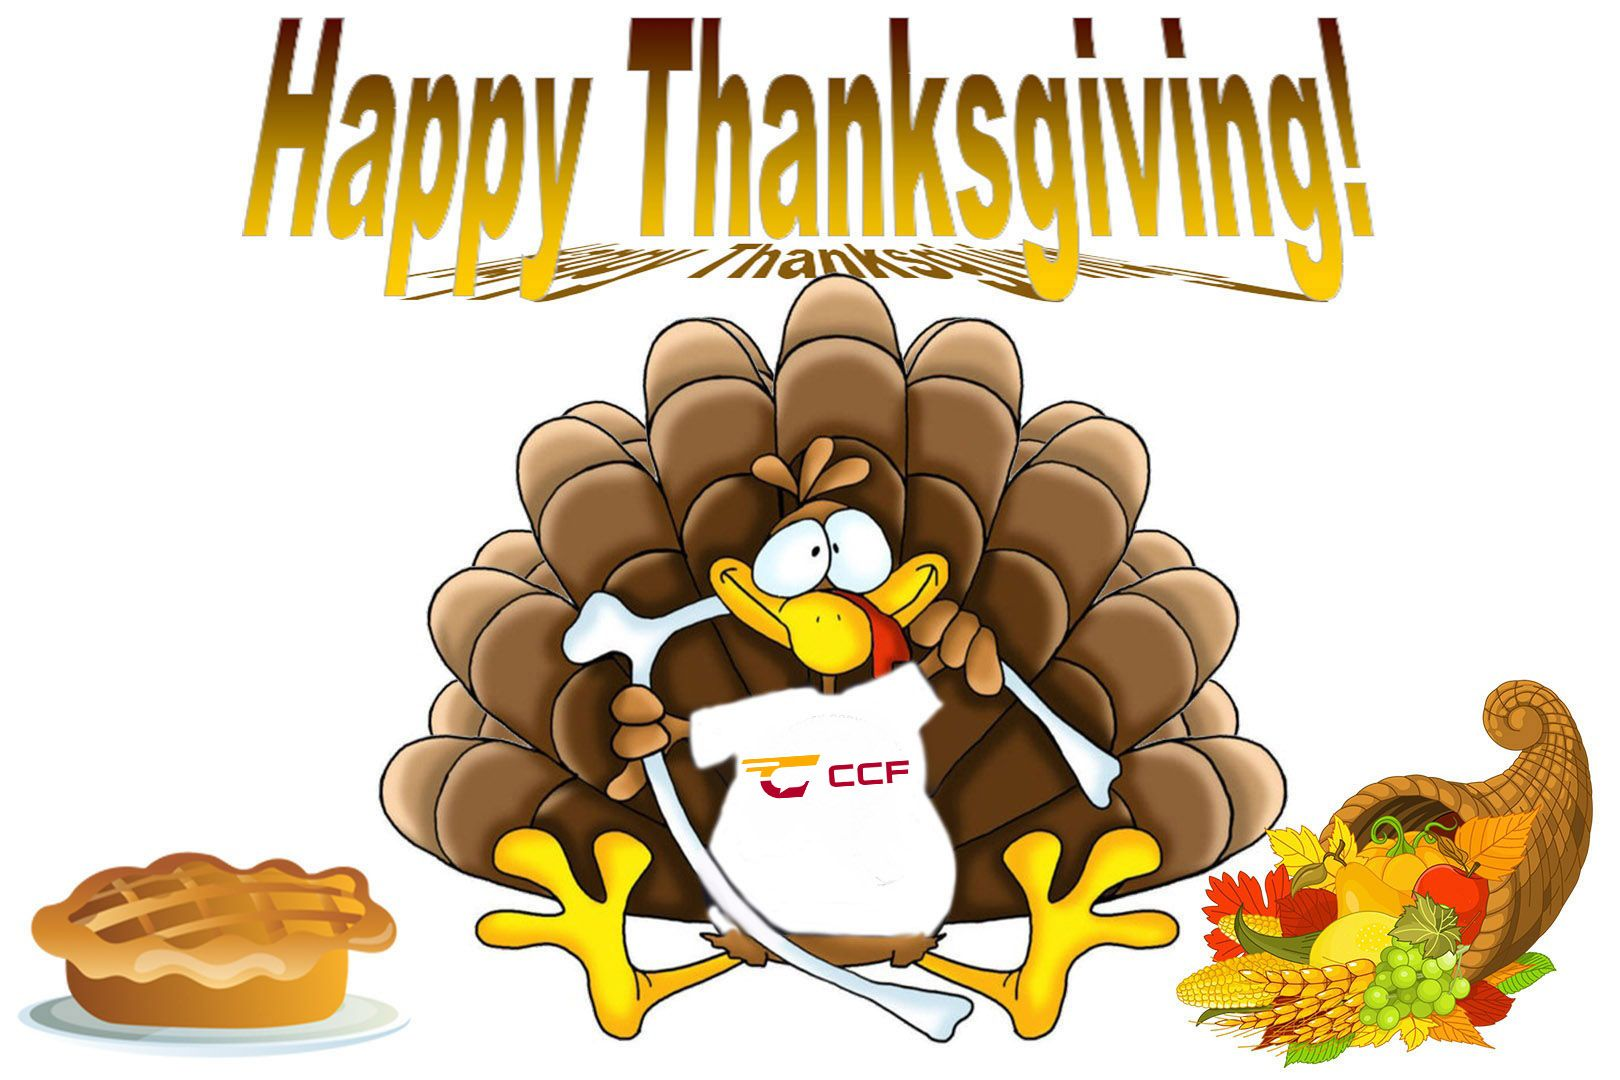 SCCC Thanksgiving 2019 - Copy.jpg